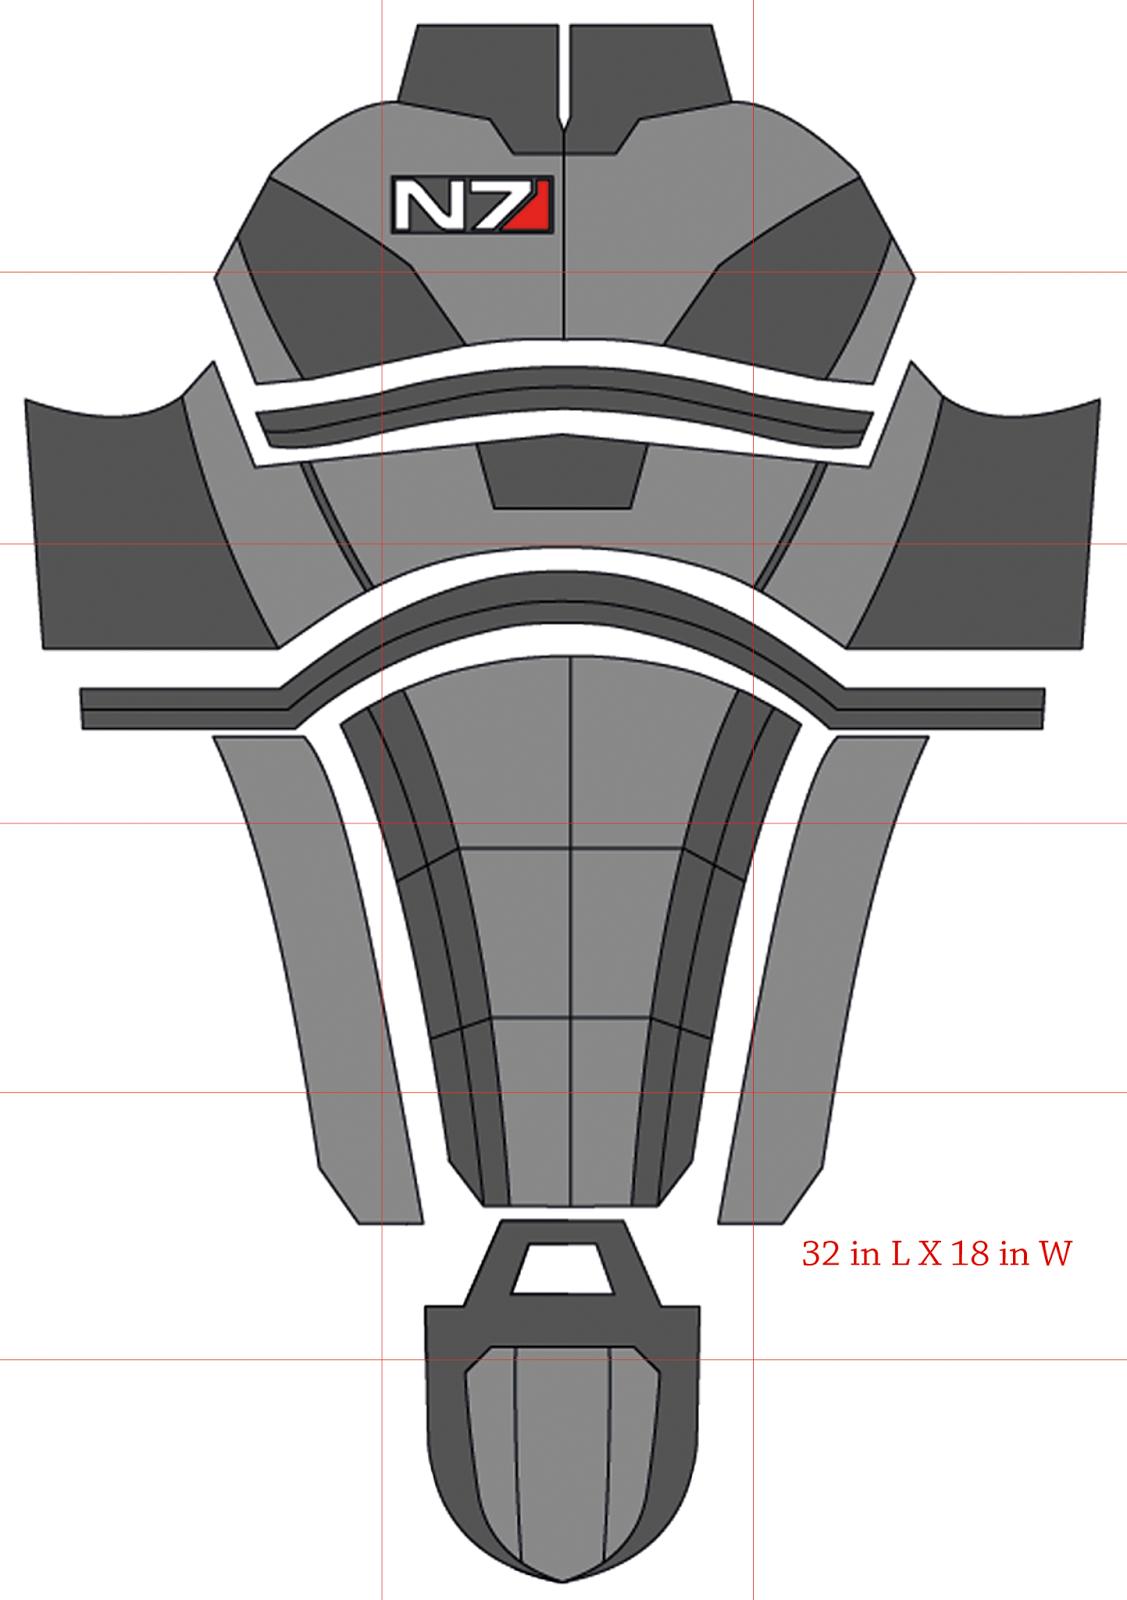 deathstroke armor template - kaotik projects